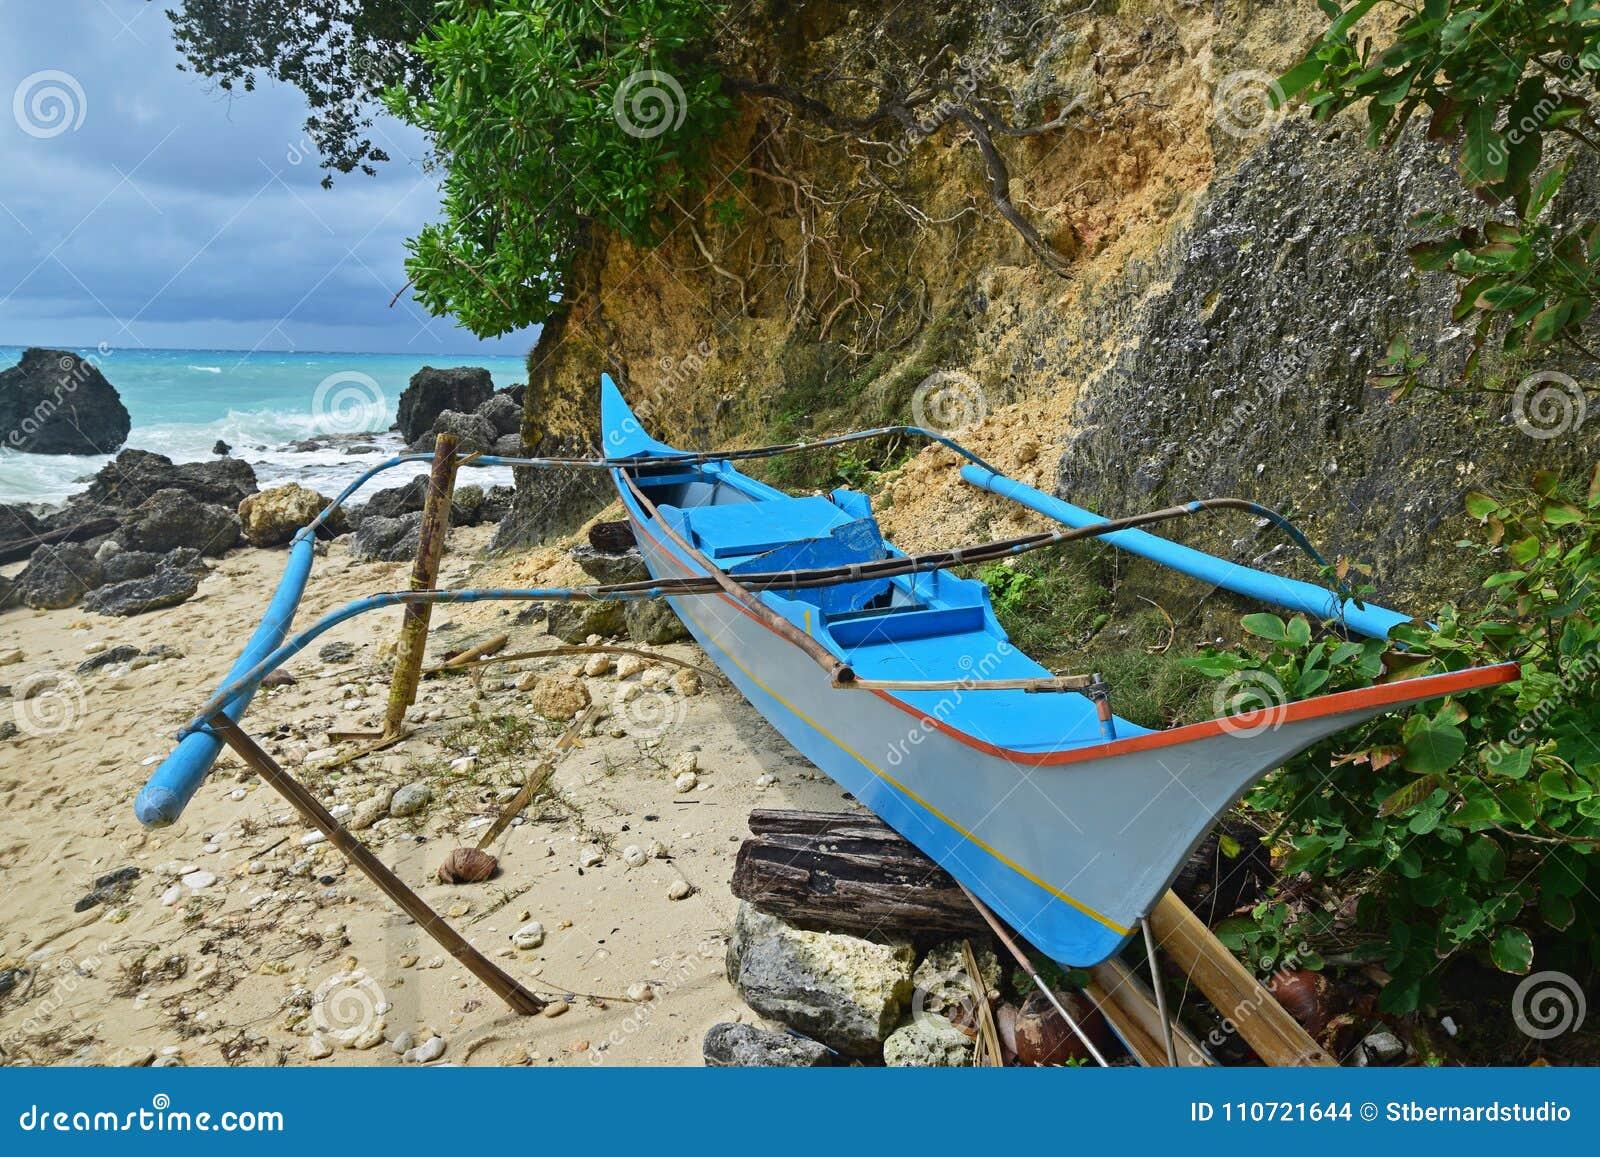 Ein traditionelles blaues Farbe-paraw parkte auf dem Strand in Boracay-Insel